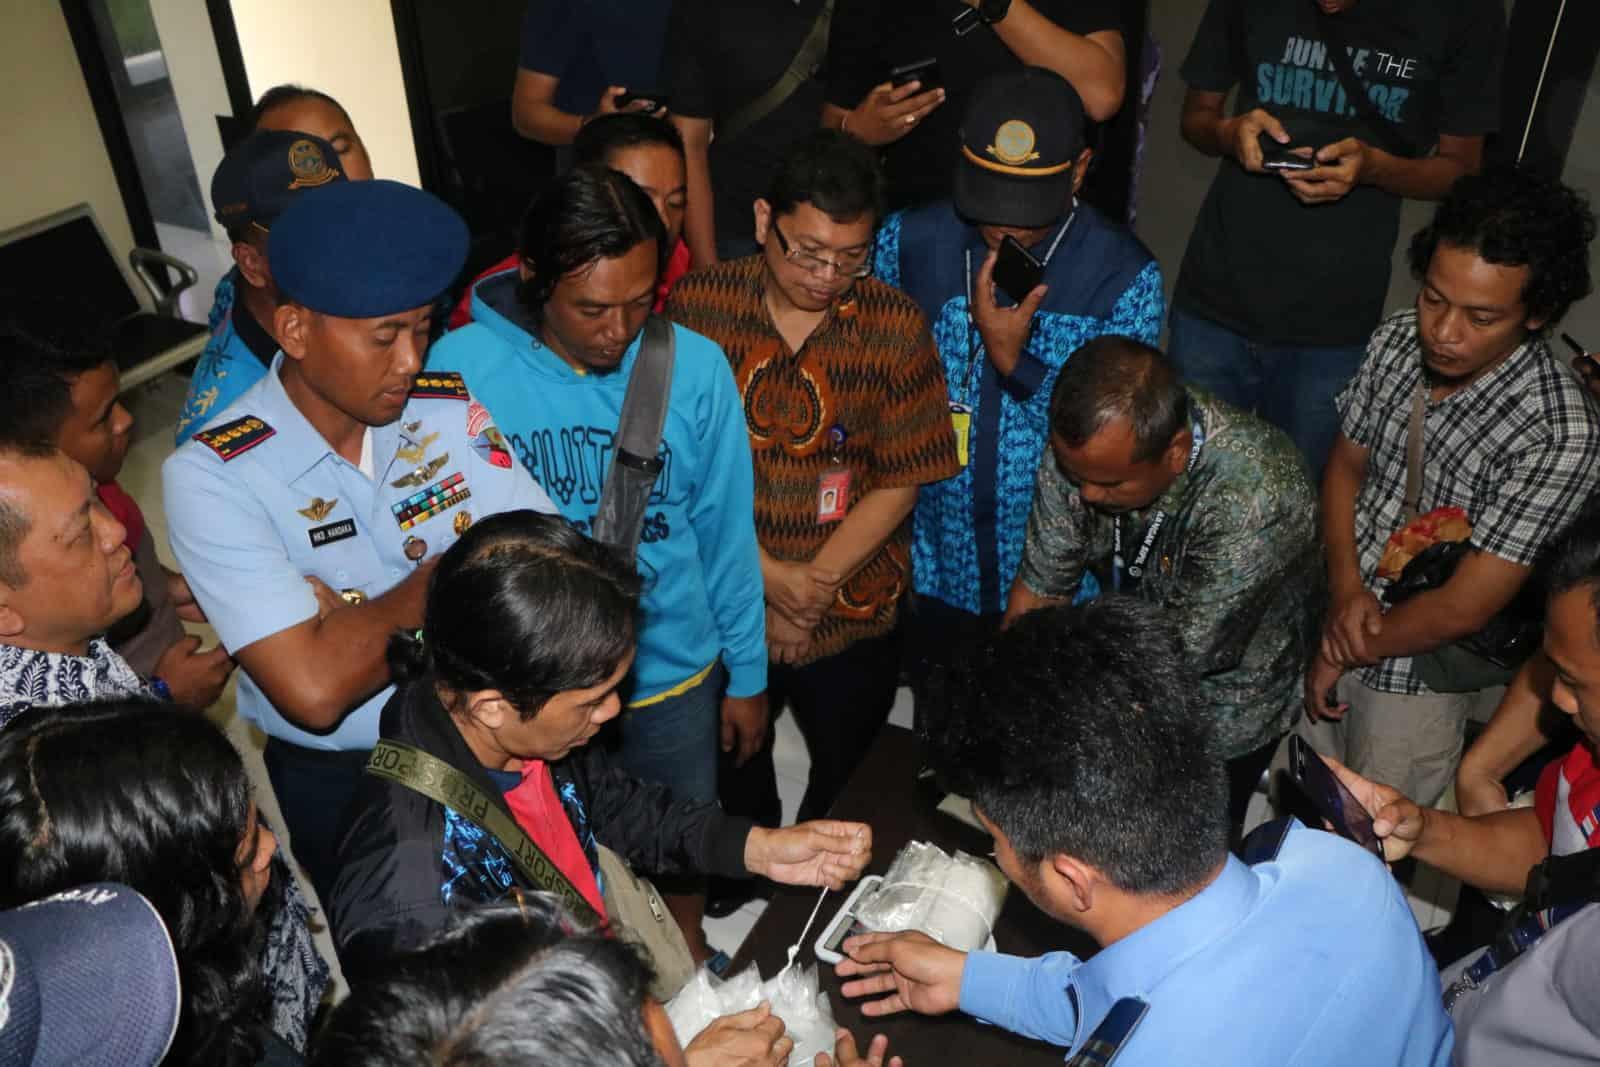 Personel Lanud Anang Busra Gagalkan Penyelundupan Sabu Di Bandara Juwata Tarakan